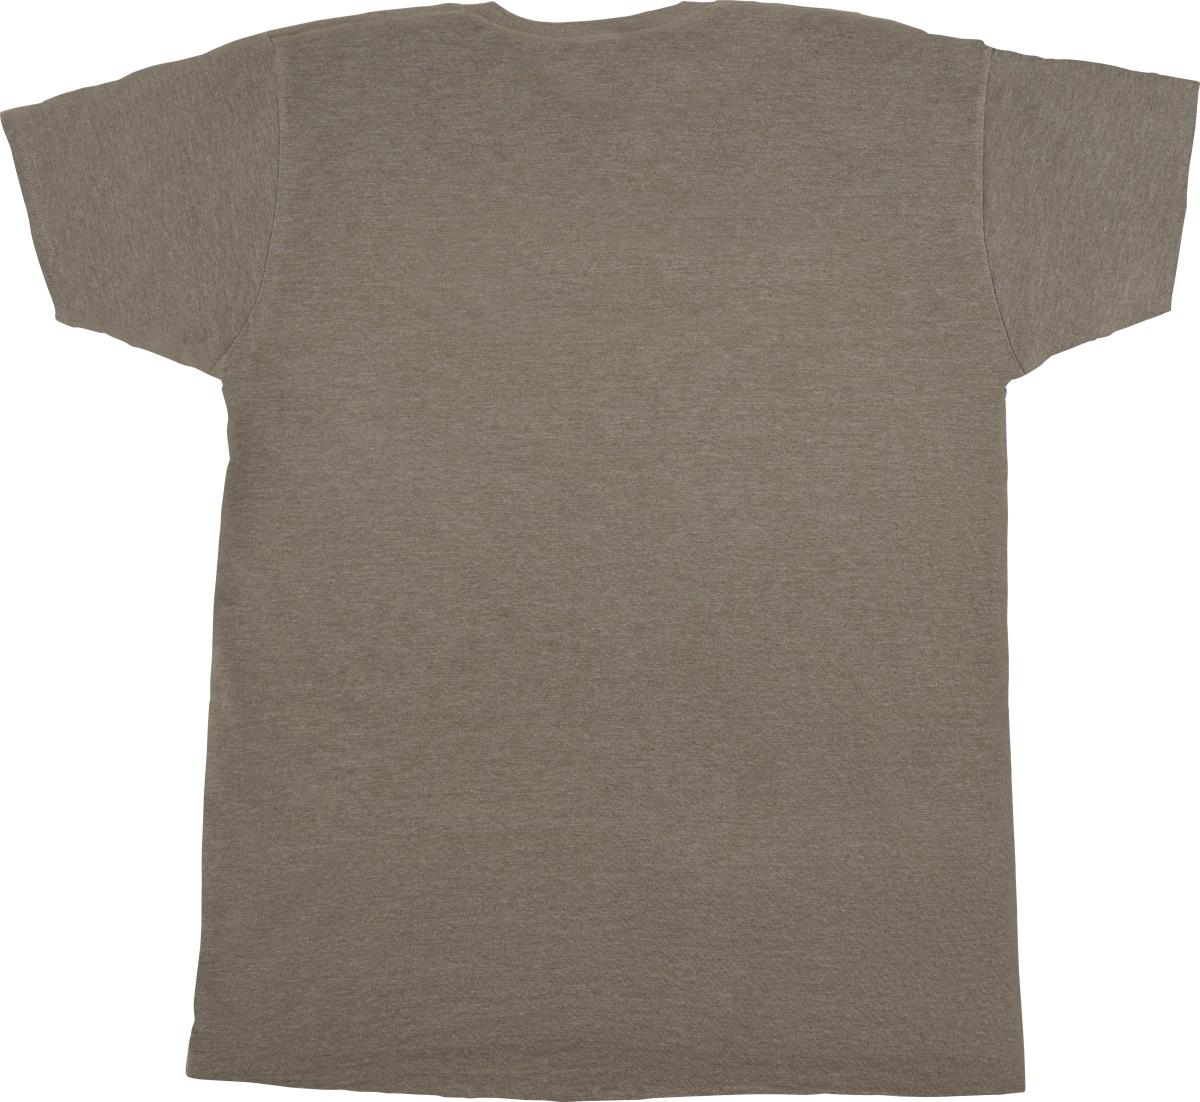 Charvel Charvel® Toothpaste Logo T-Shirt, Heather Green, L